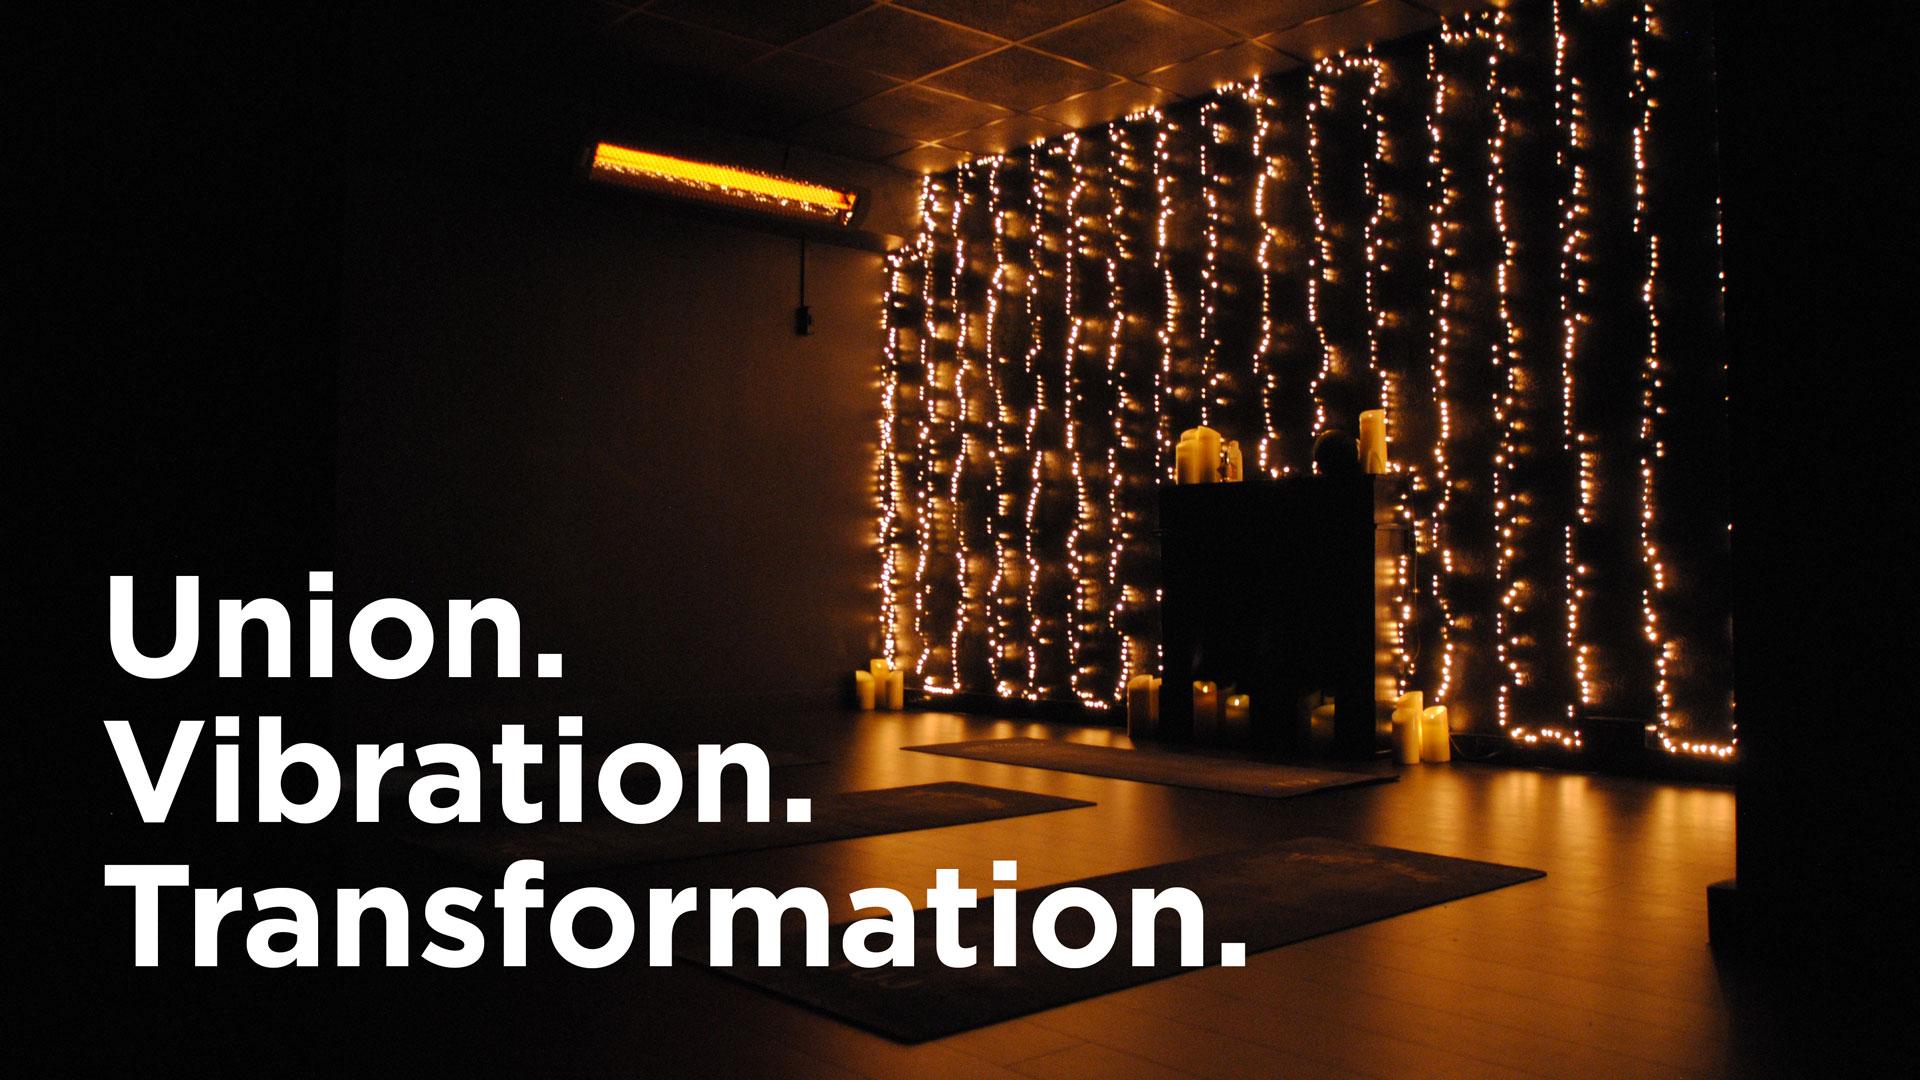 header-union-vibration-transformation-yys-2